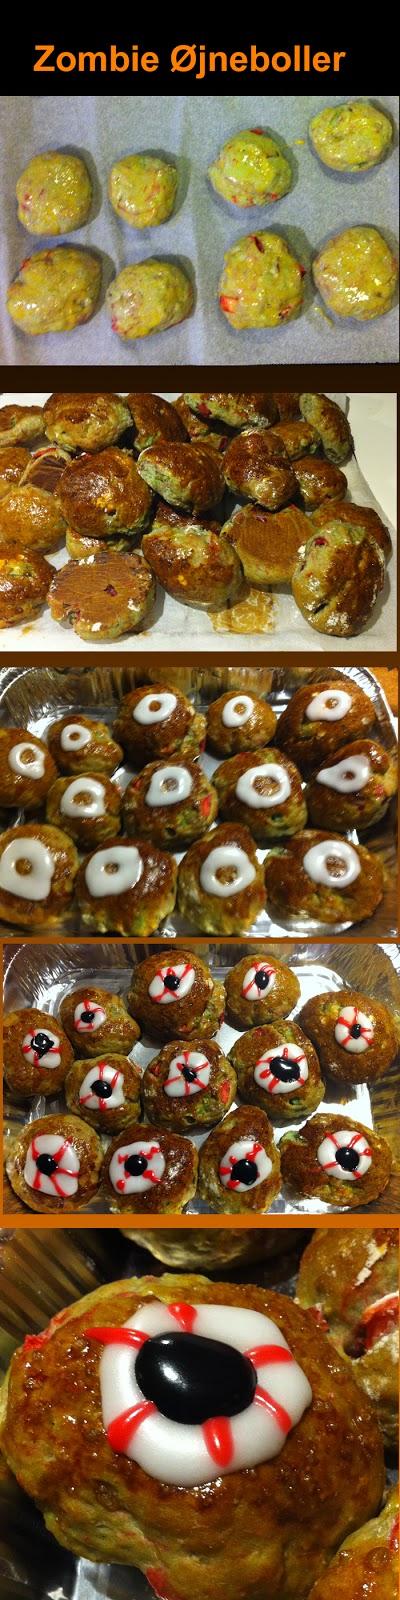 Zombue eye ball you can eat